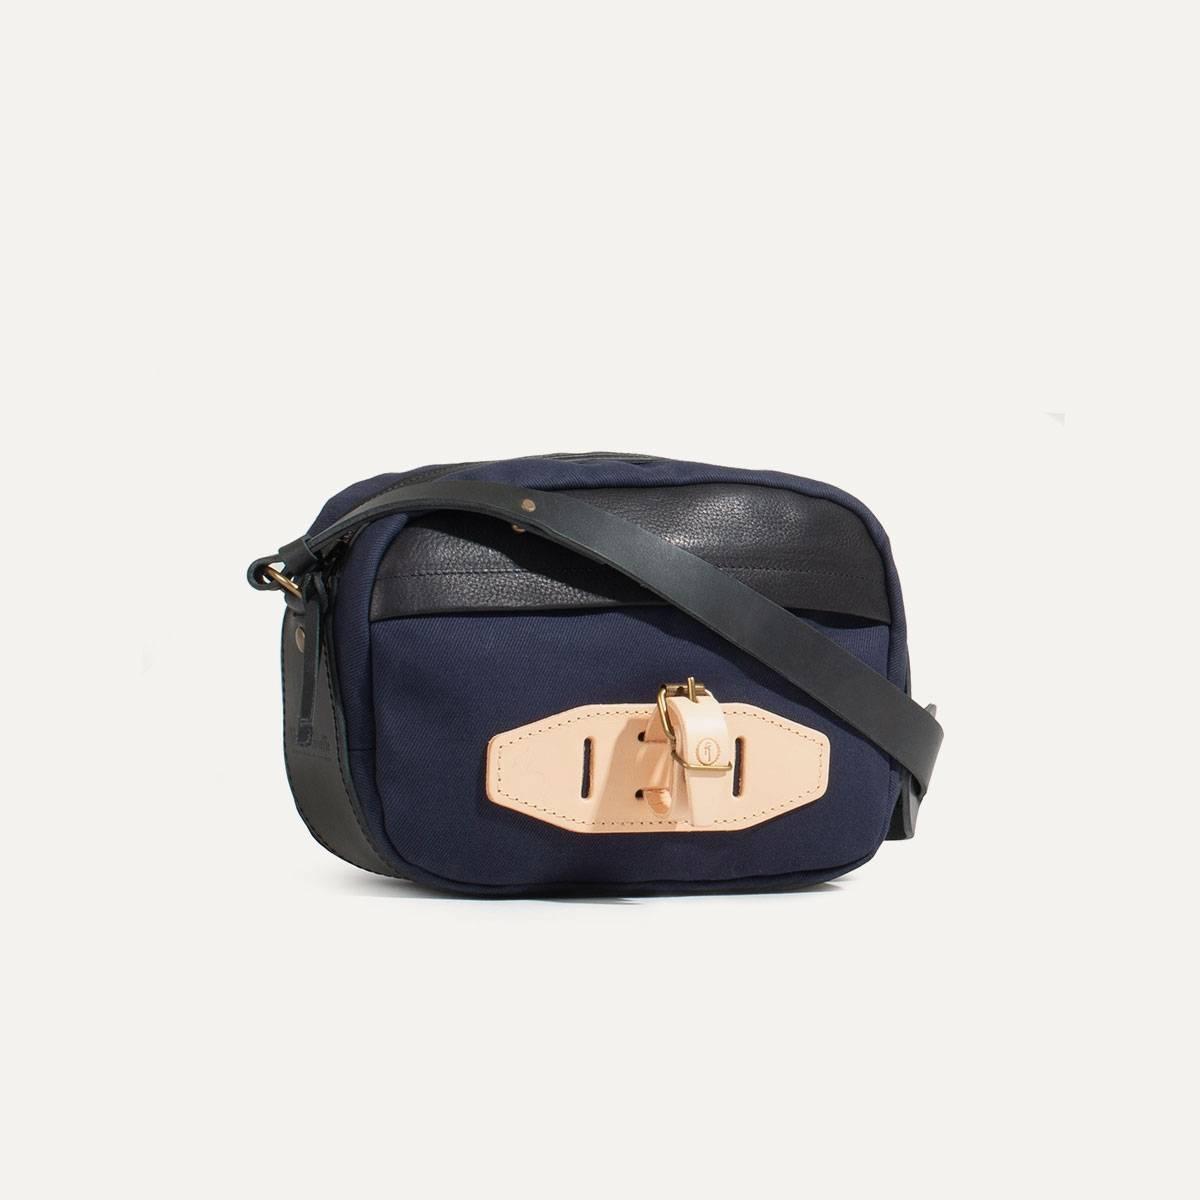 Honshu Belt bag - Navy / Black (image n°3)